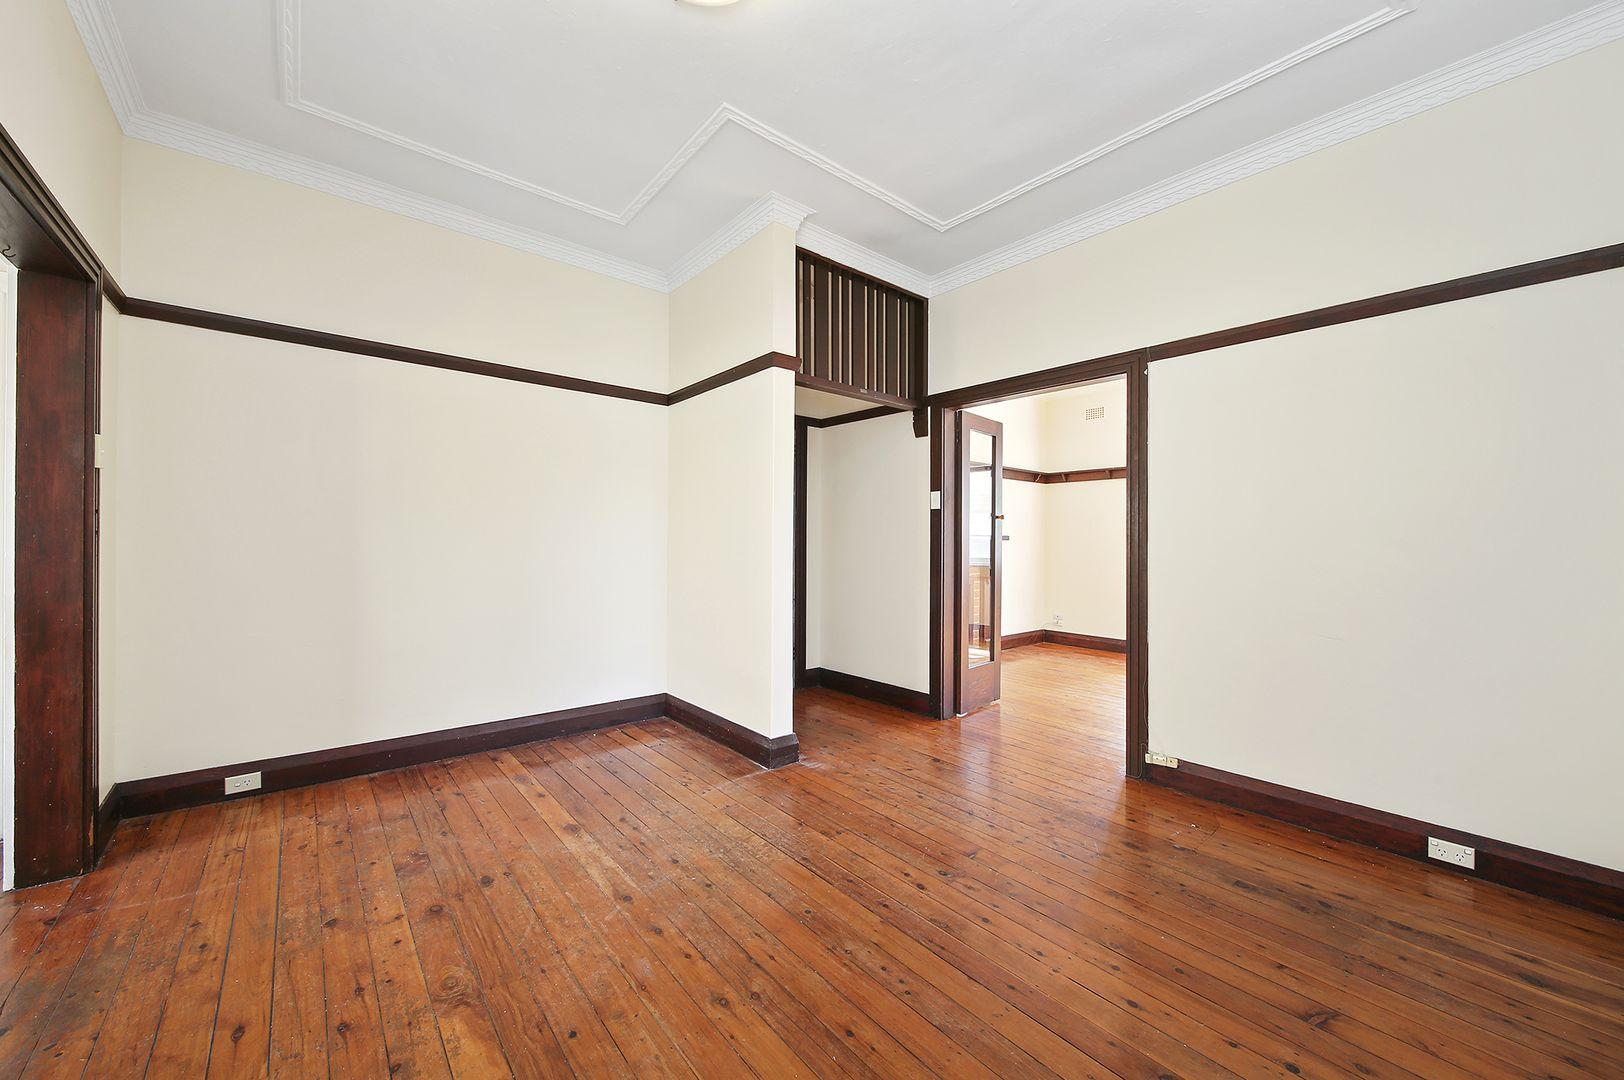 1/19 Vicars Ave, North Bondi NSW 2026, Image 2